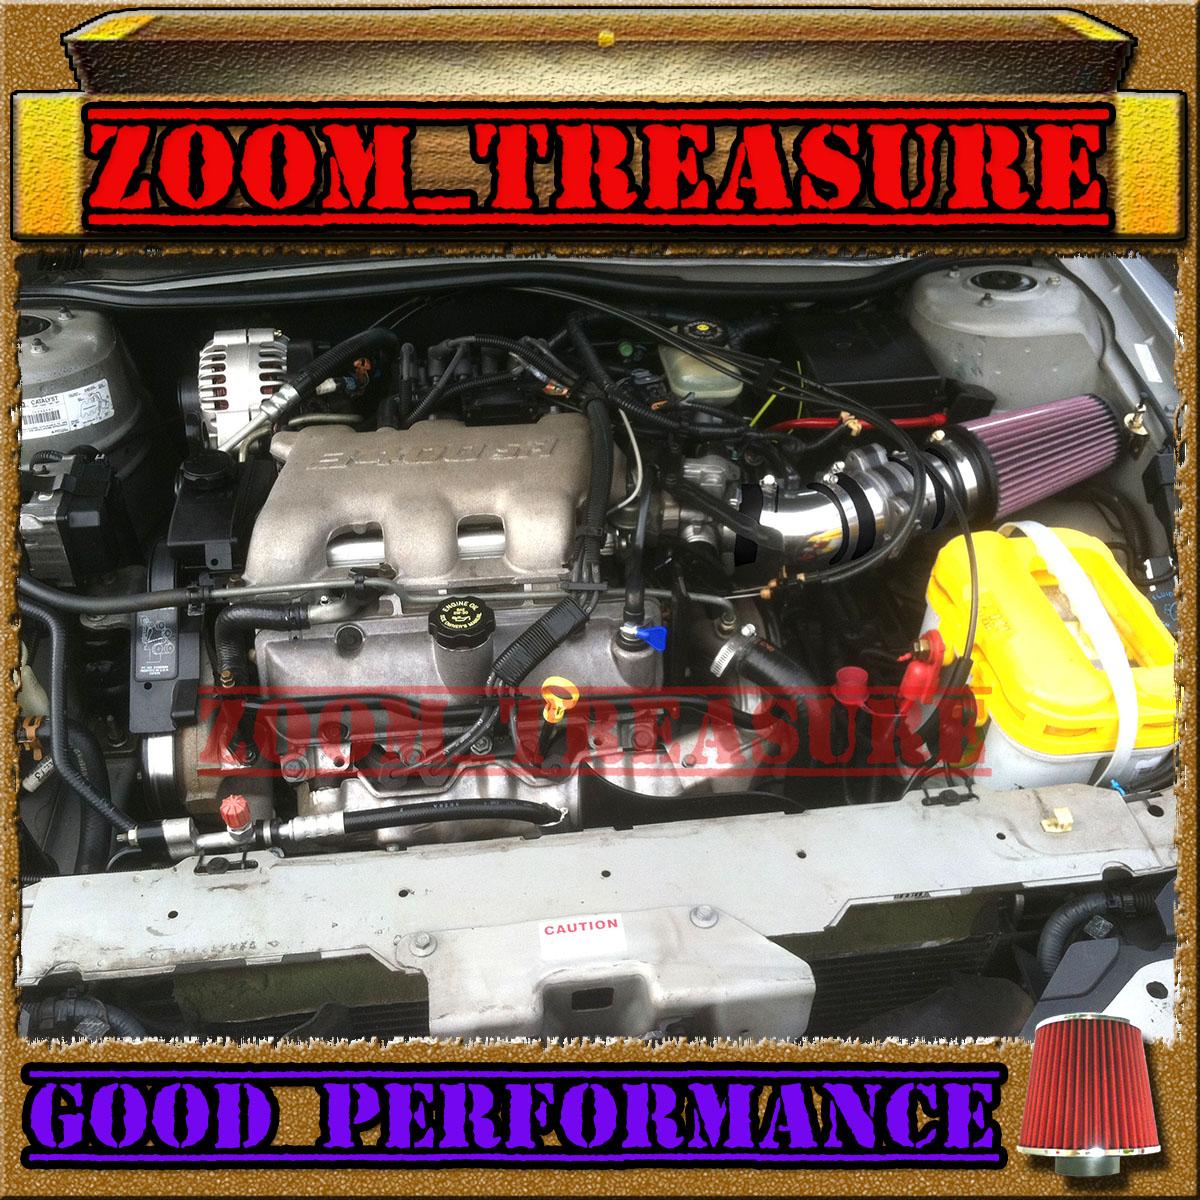 RED 96 97 98 BUICK SKYLARK//OLDSM ACHIEVA//PONTIAC GRAND AM 3.1L V6 AIR INTAKE TB